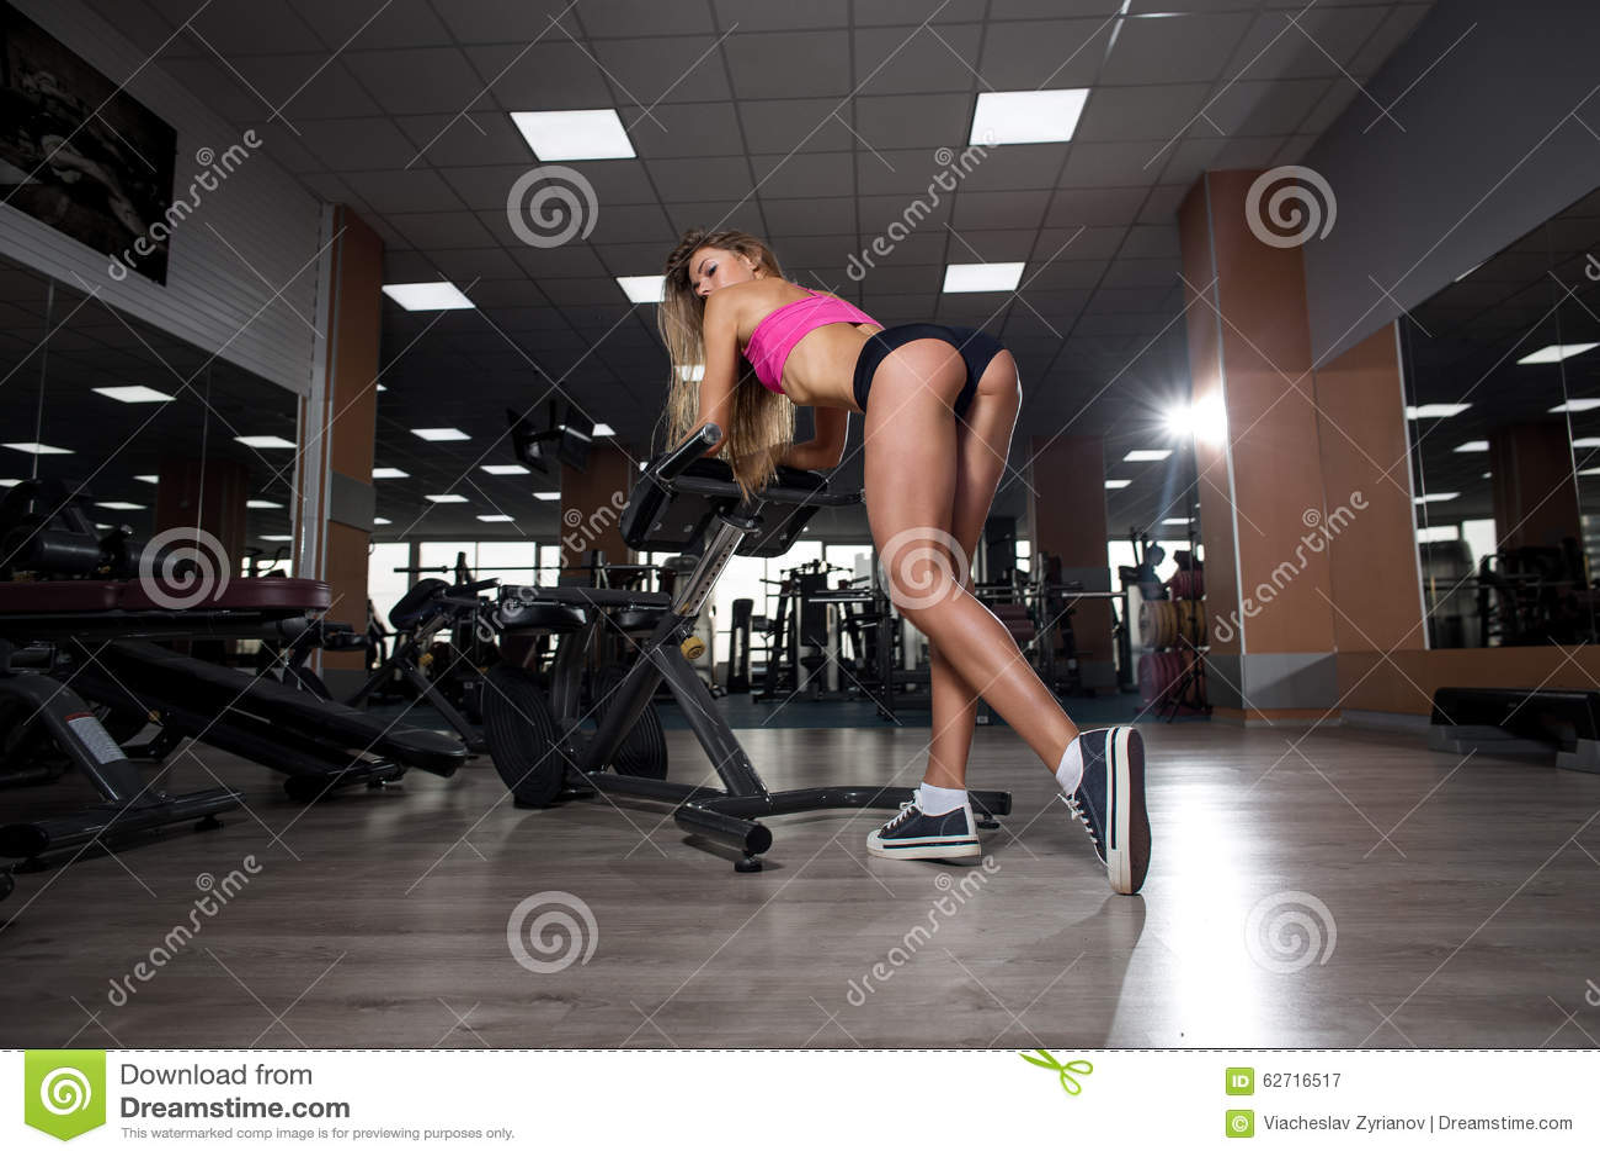 Download Προκλητικό όμορφο νέο κορίτσι ικανότητας που στηρίζεται μετά από τις κοντόχοντρες ασκήσεις Στοκ Εικόνα - εικόνα από υγεία, τακτοποίηση: 62716517